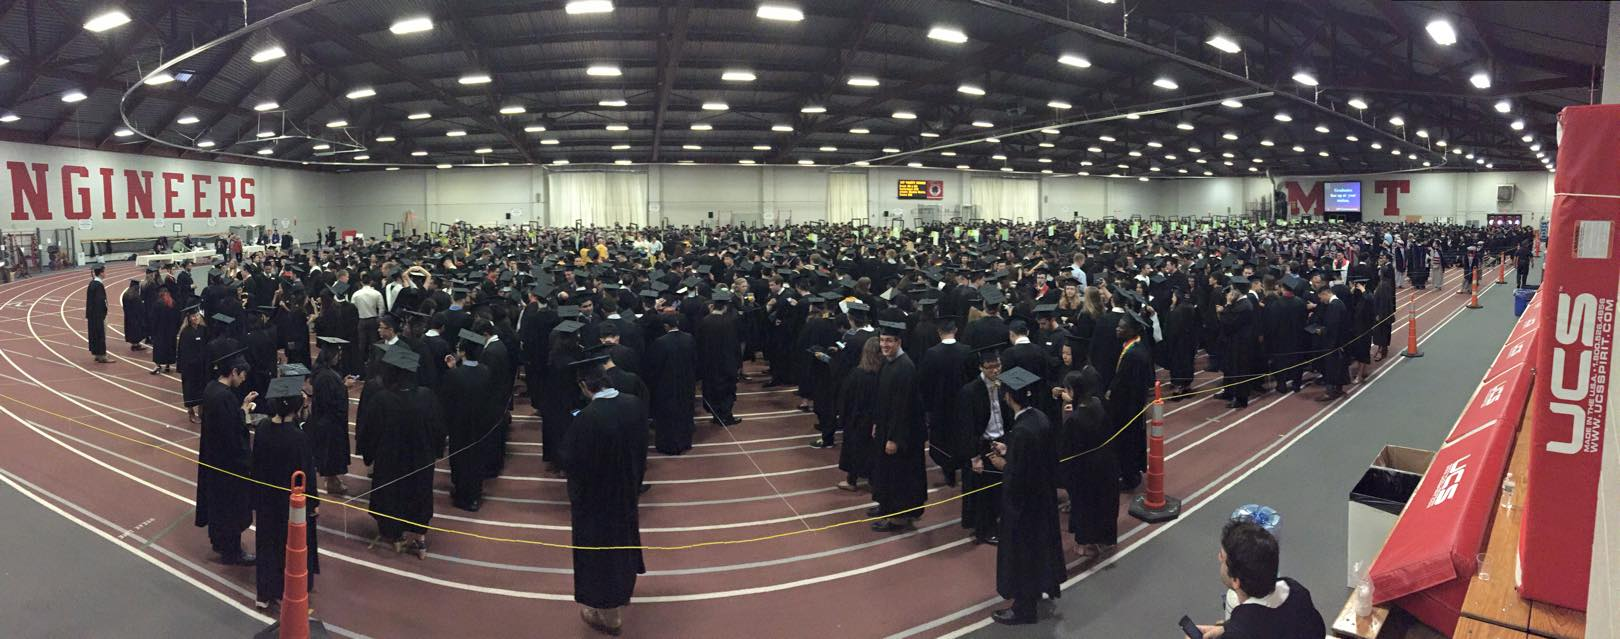 Graduation M.I.T. 2015